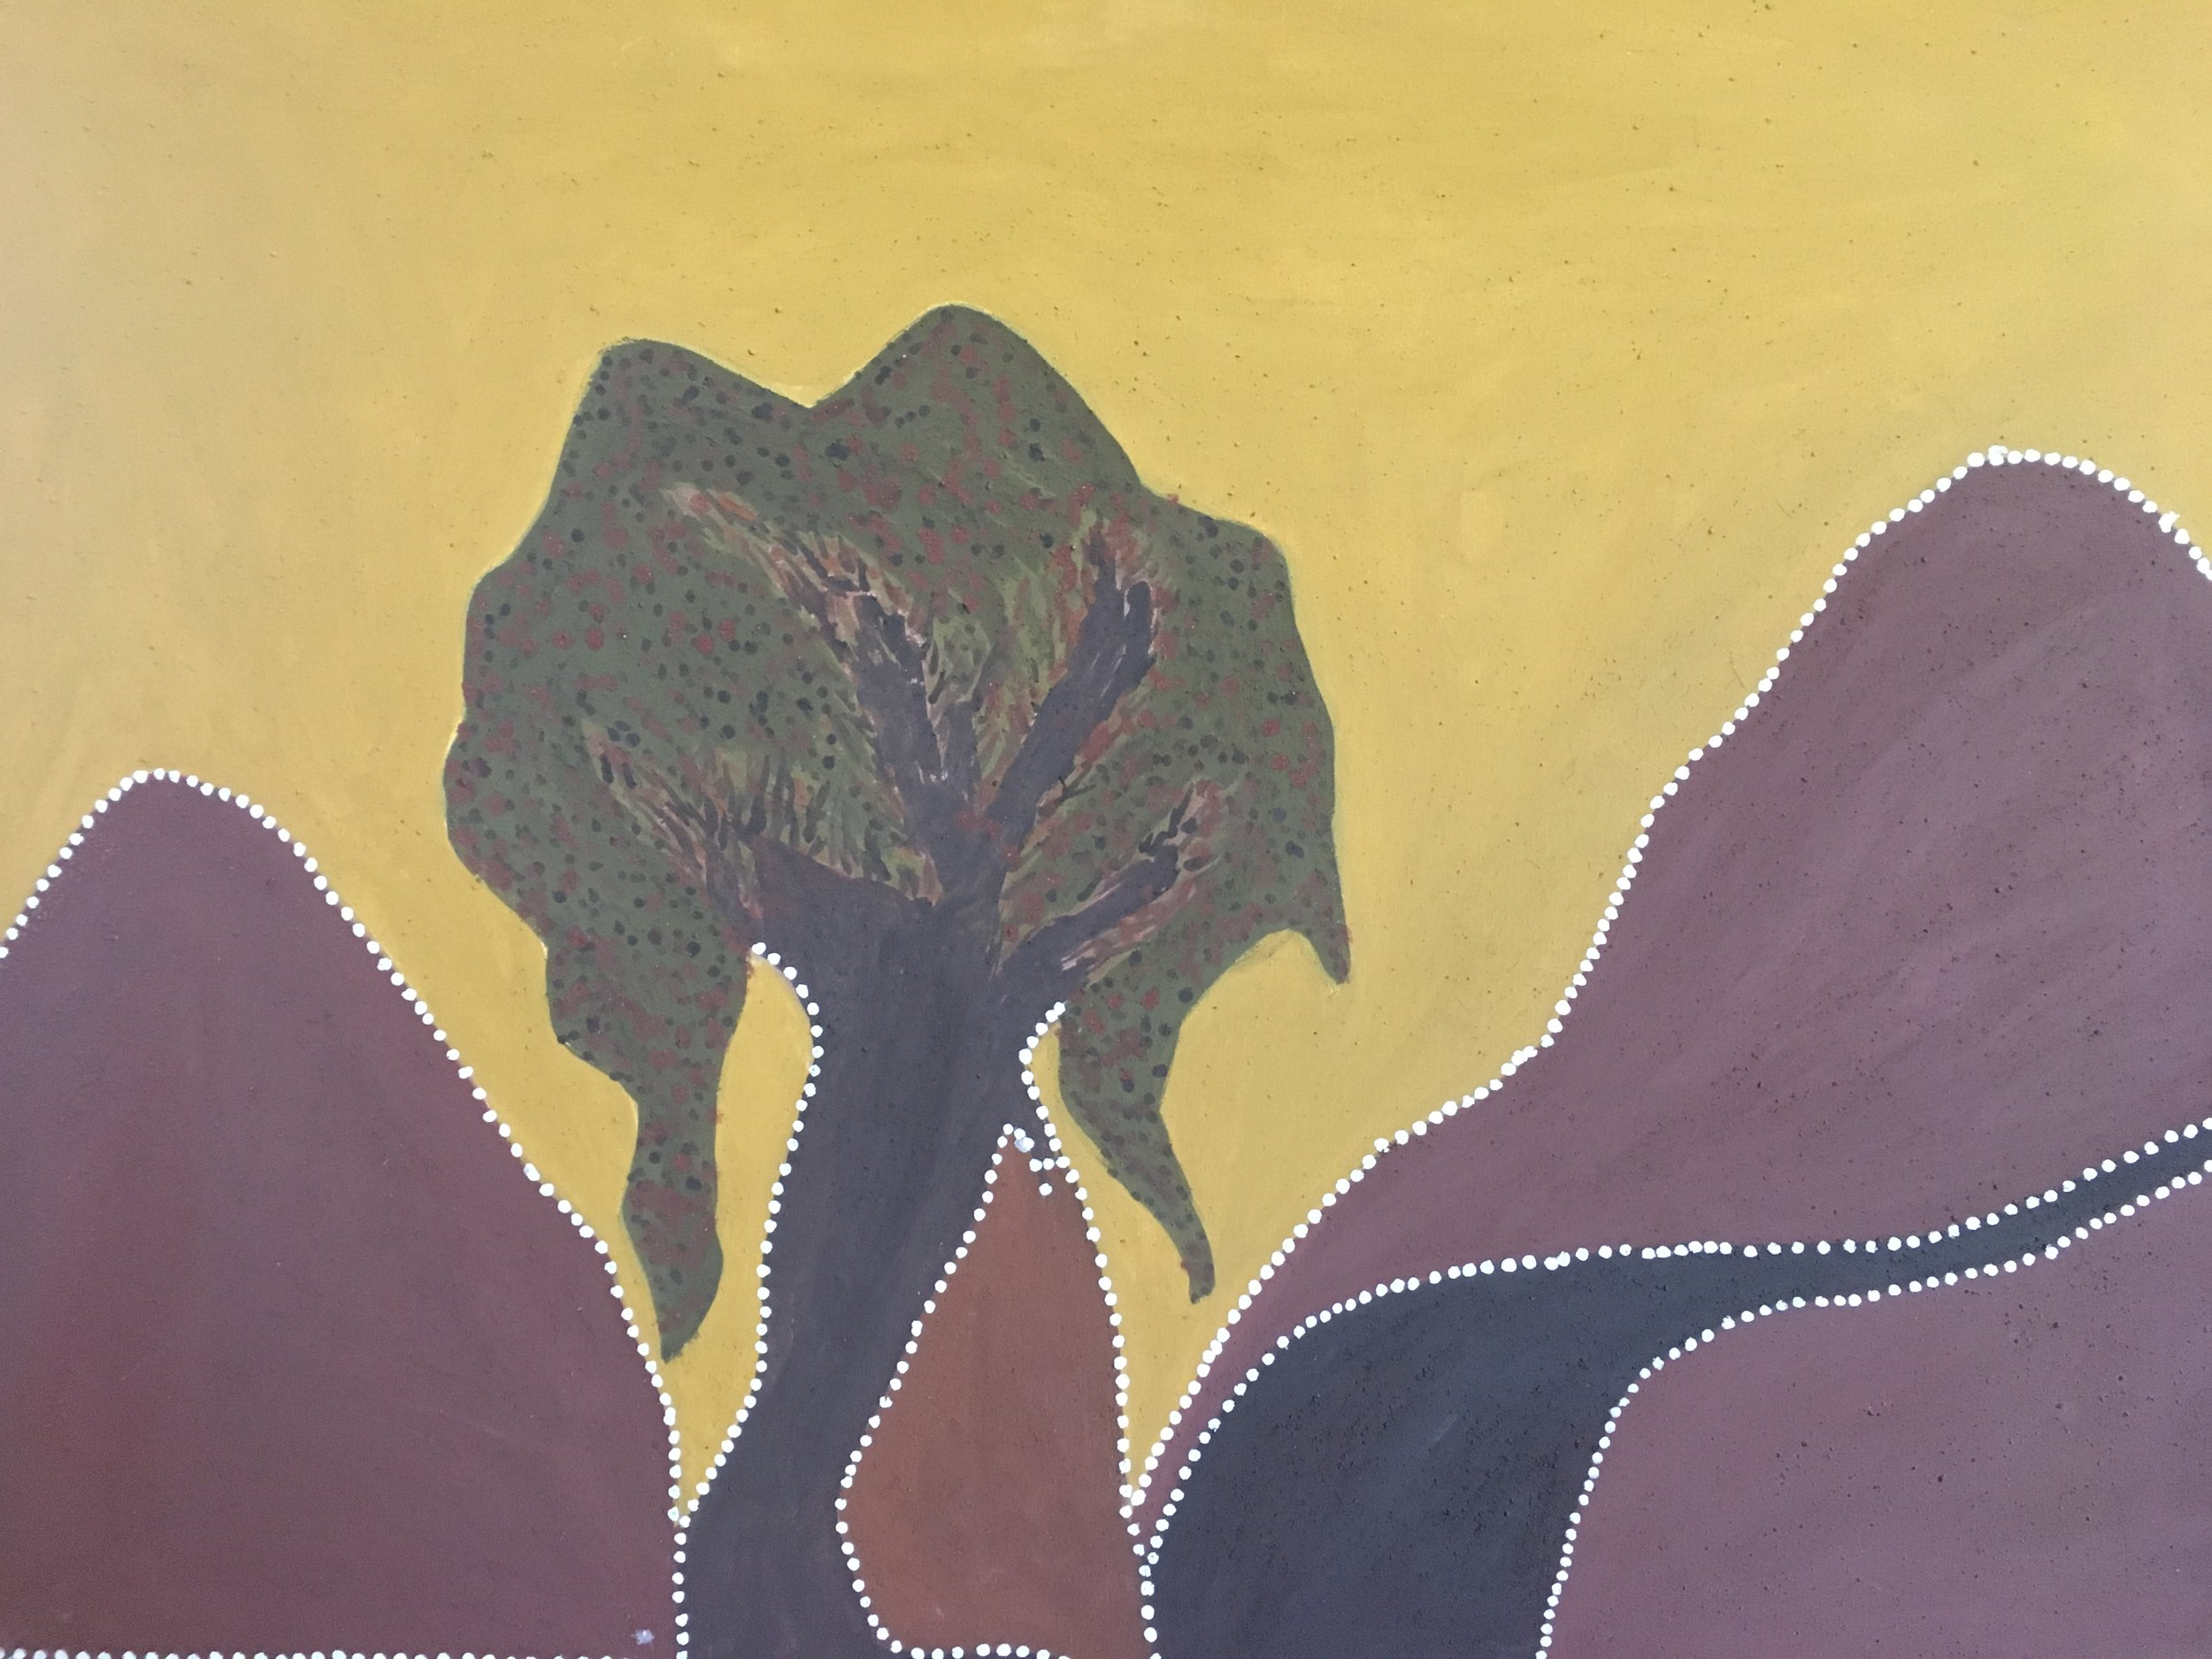 Gordon Barney. Joogoorrool (Bush Orange) - Birnoo Country. 2013  natural ochre and pigments on canvas. 90 x 120 cm. $4,000